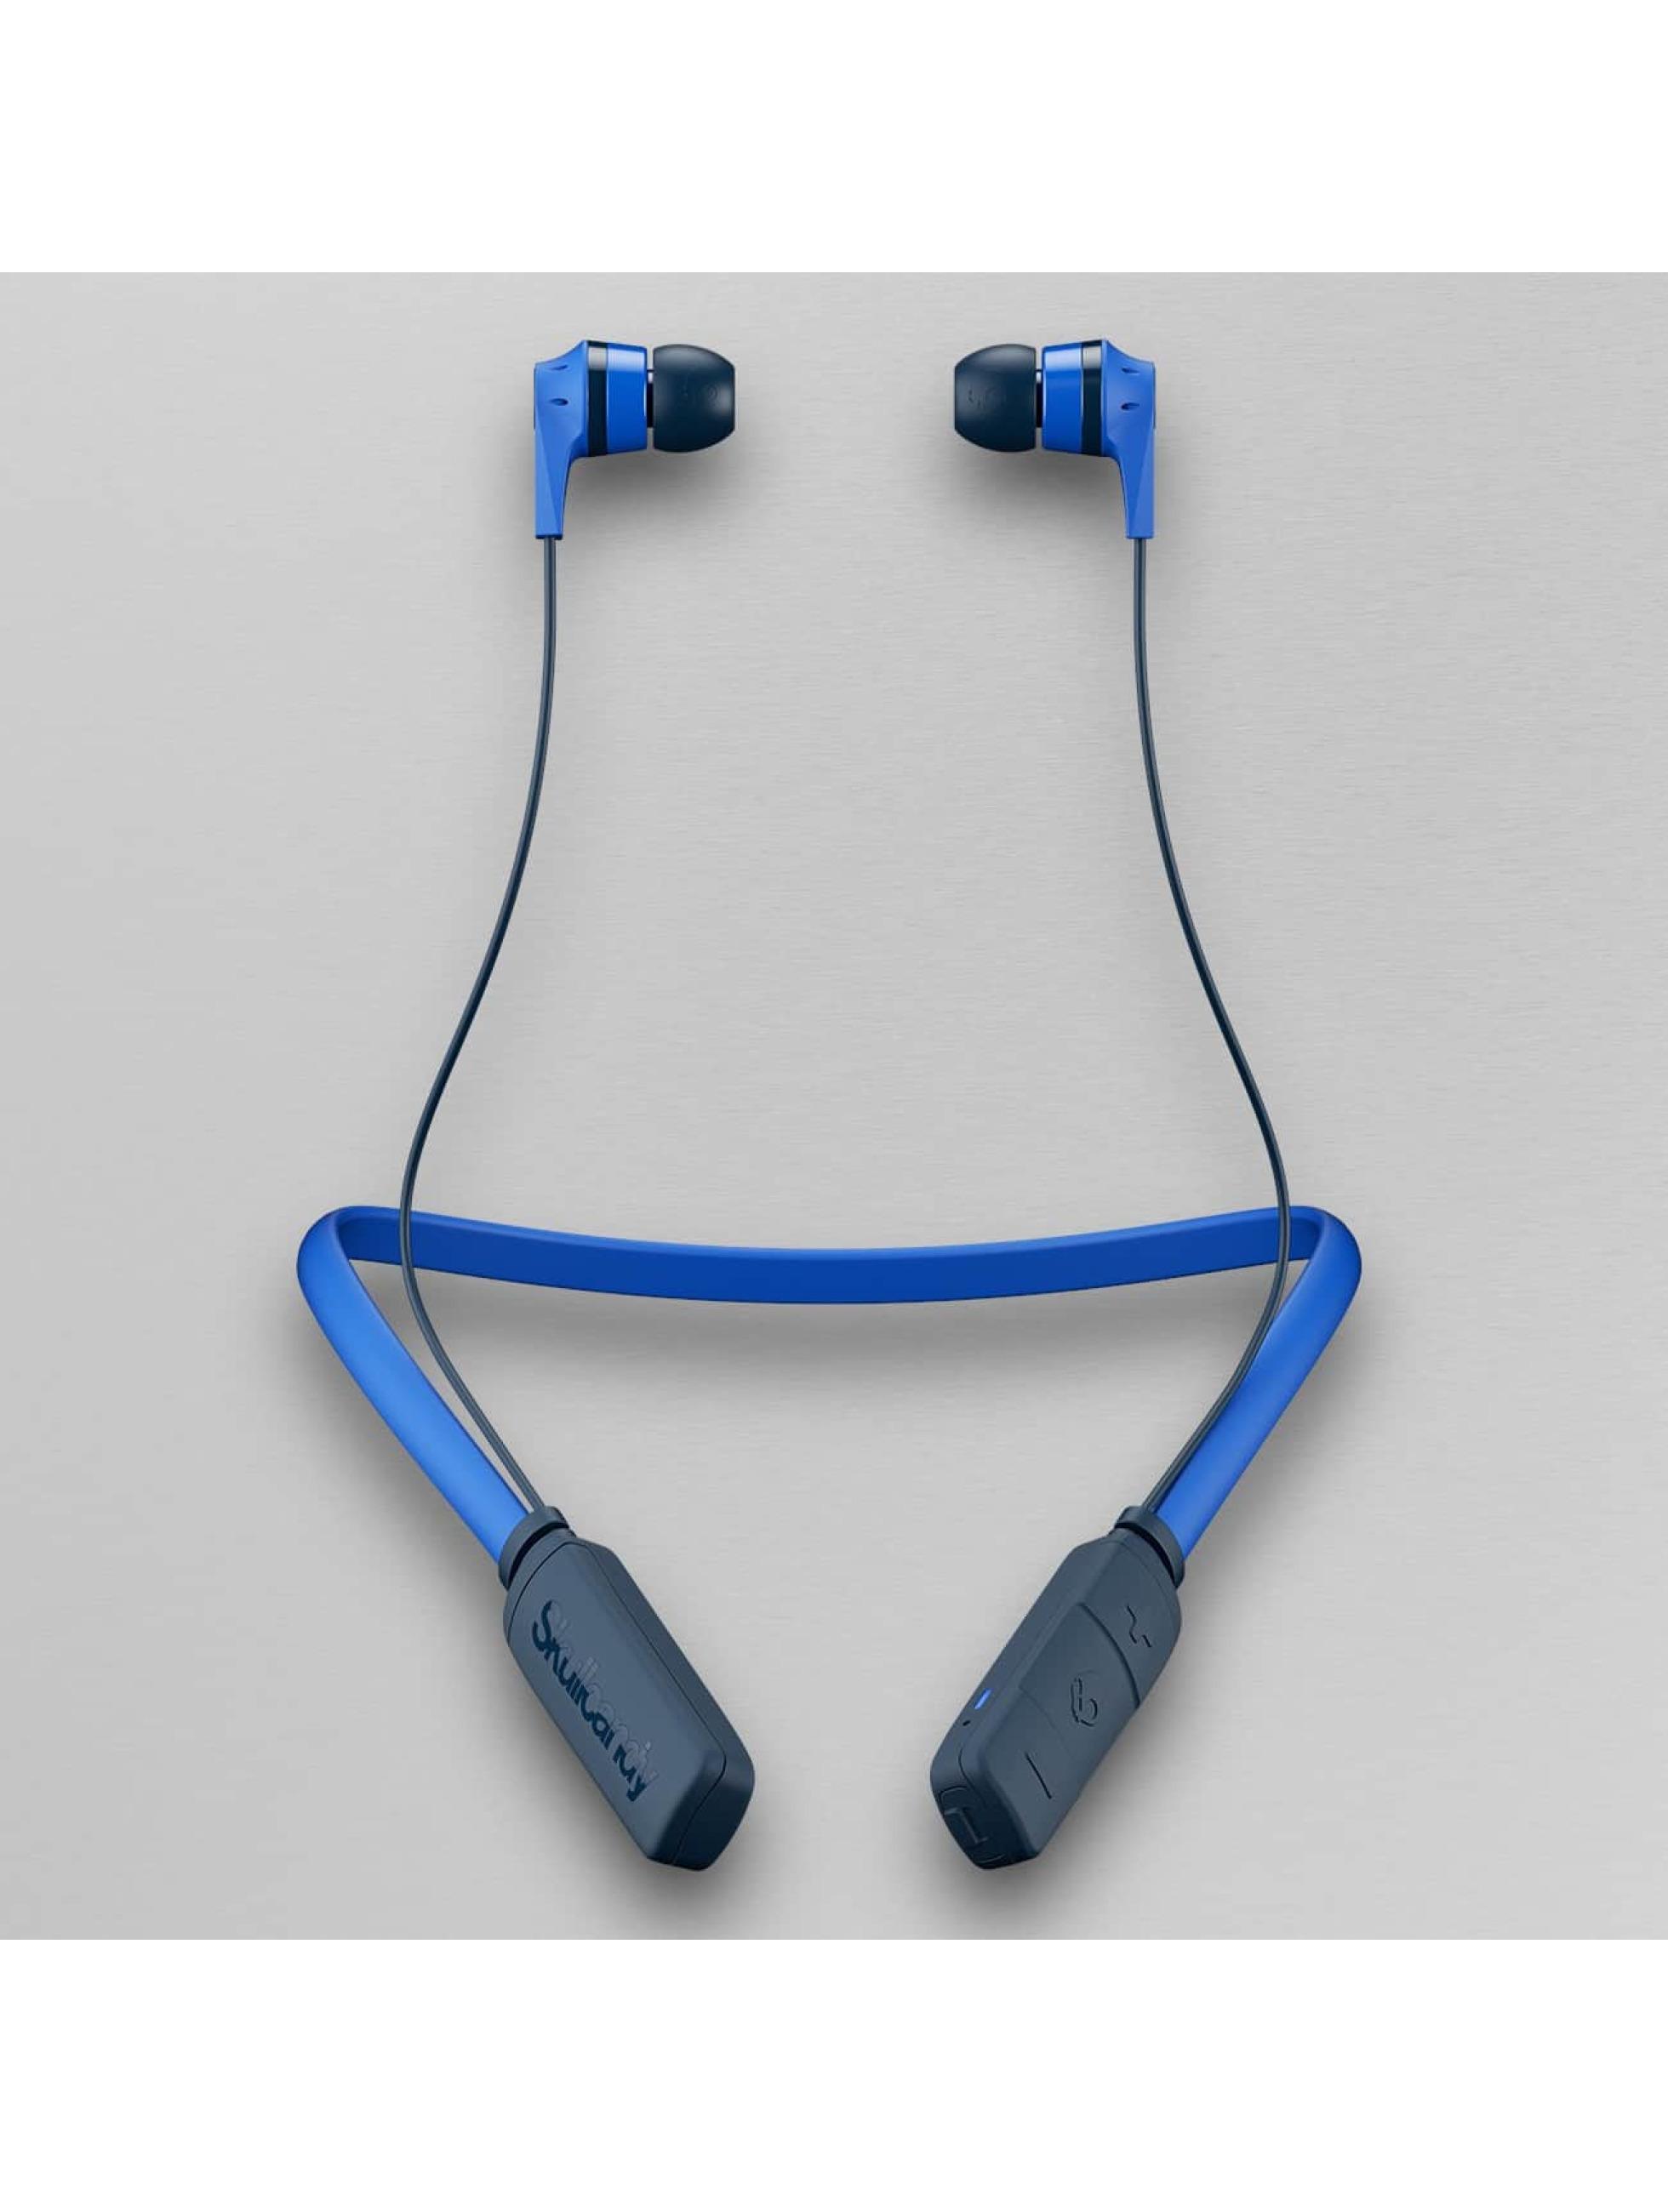 Skullcandy Kopfhörer Inked 2.0 Wireless blau